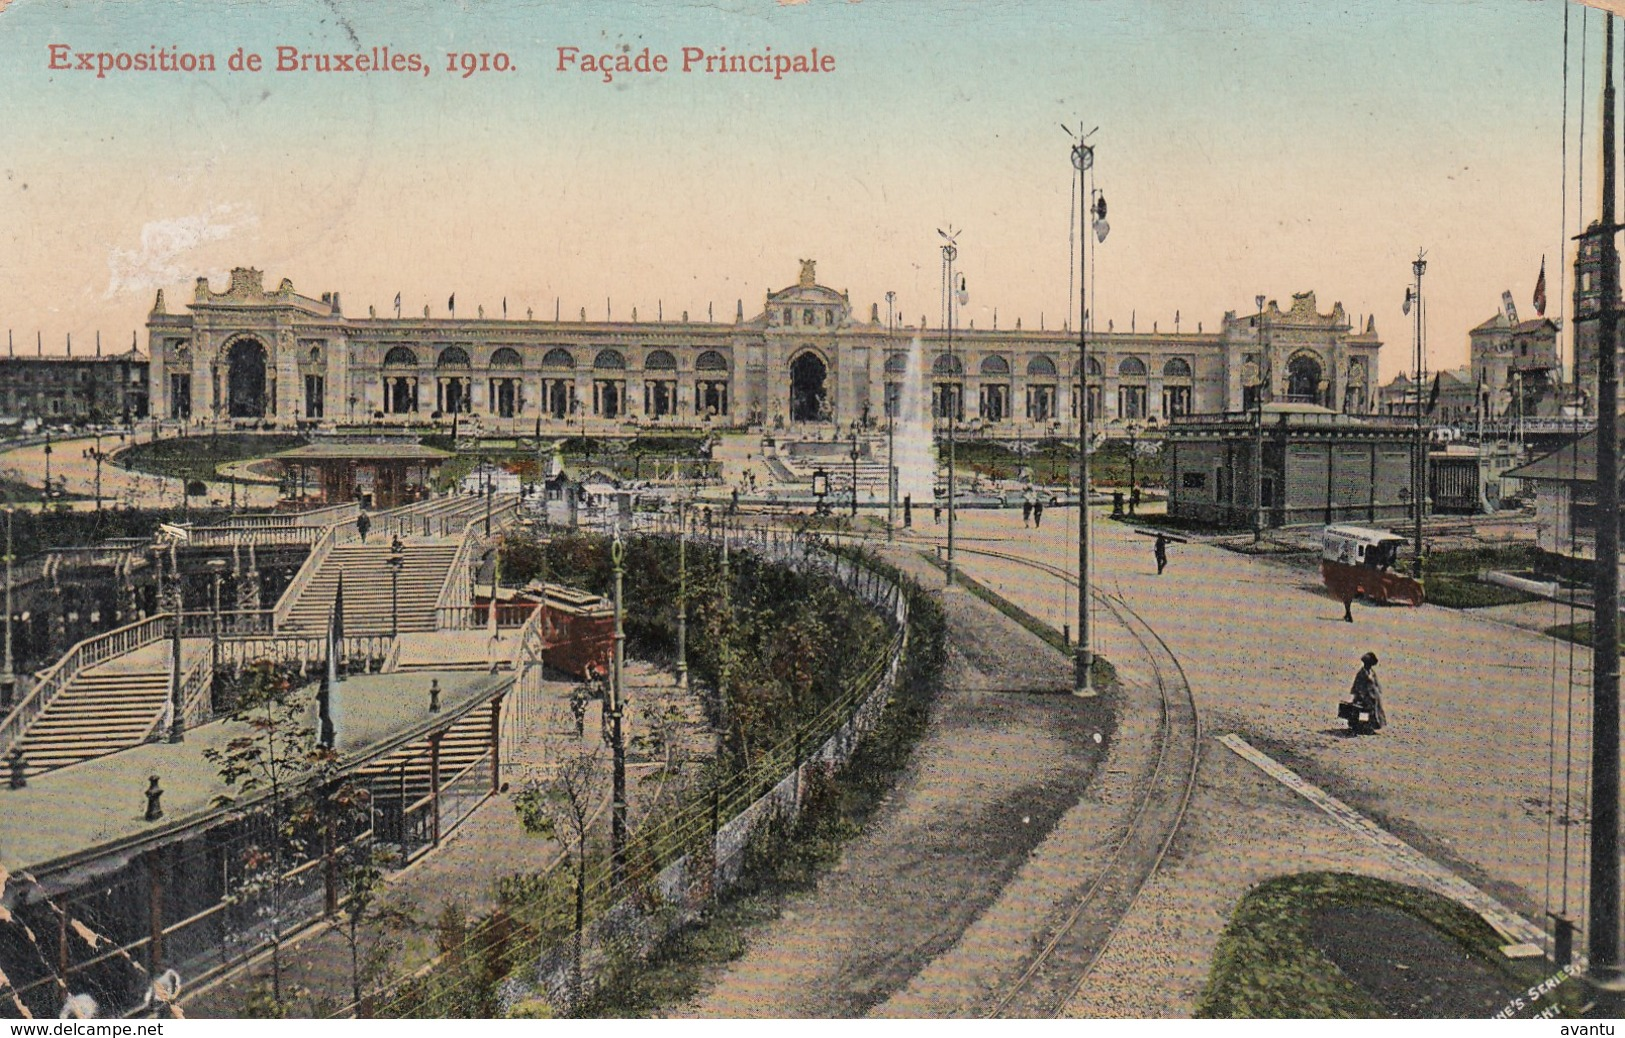 BRUSSELS / BRUXELLES / BRUSSEL / EXPOSITION  INTERNATIONALE 1910 / FACADE PRINCIPALE / TRAM / TRAMWAYS - Wereldtentoonstellingen